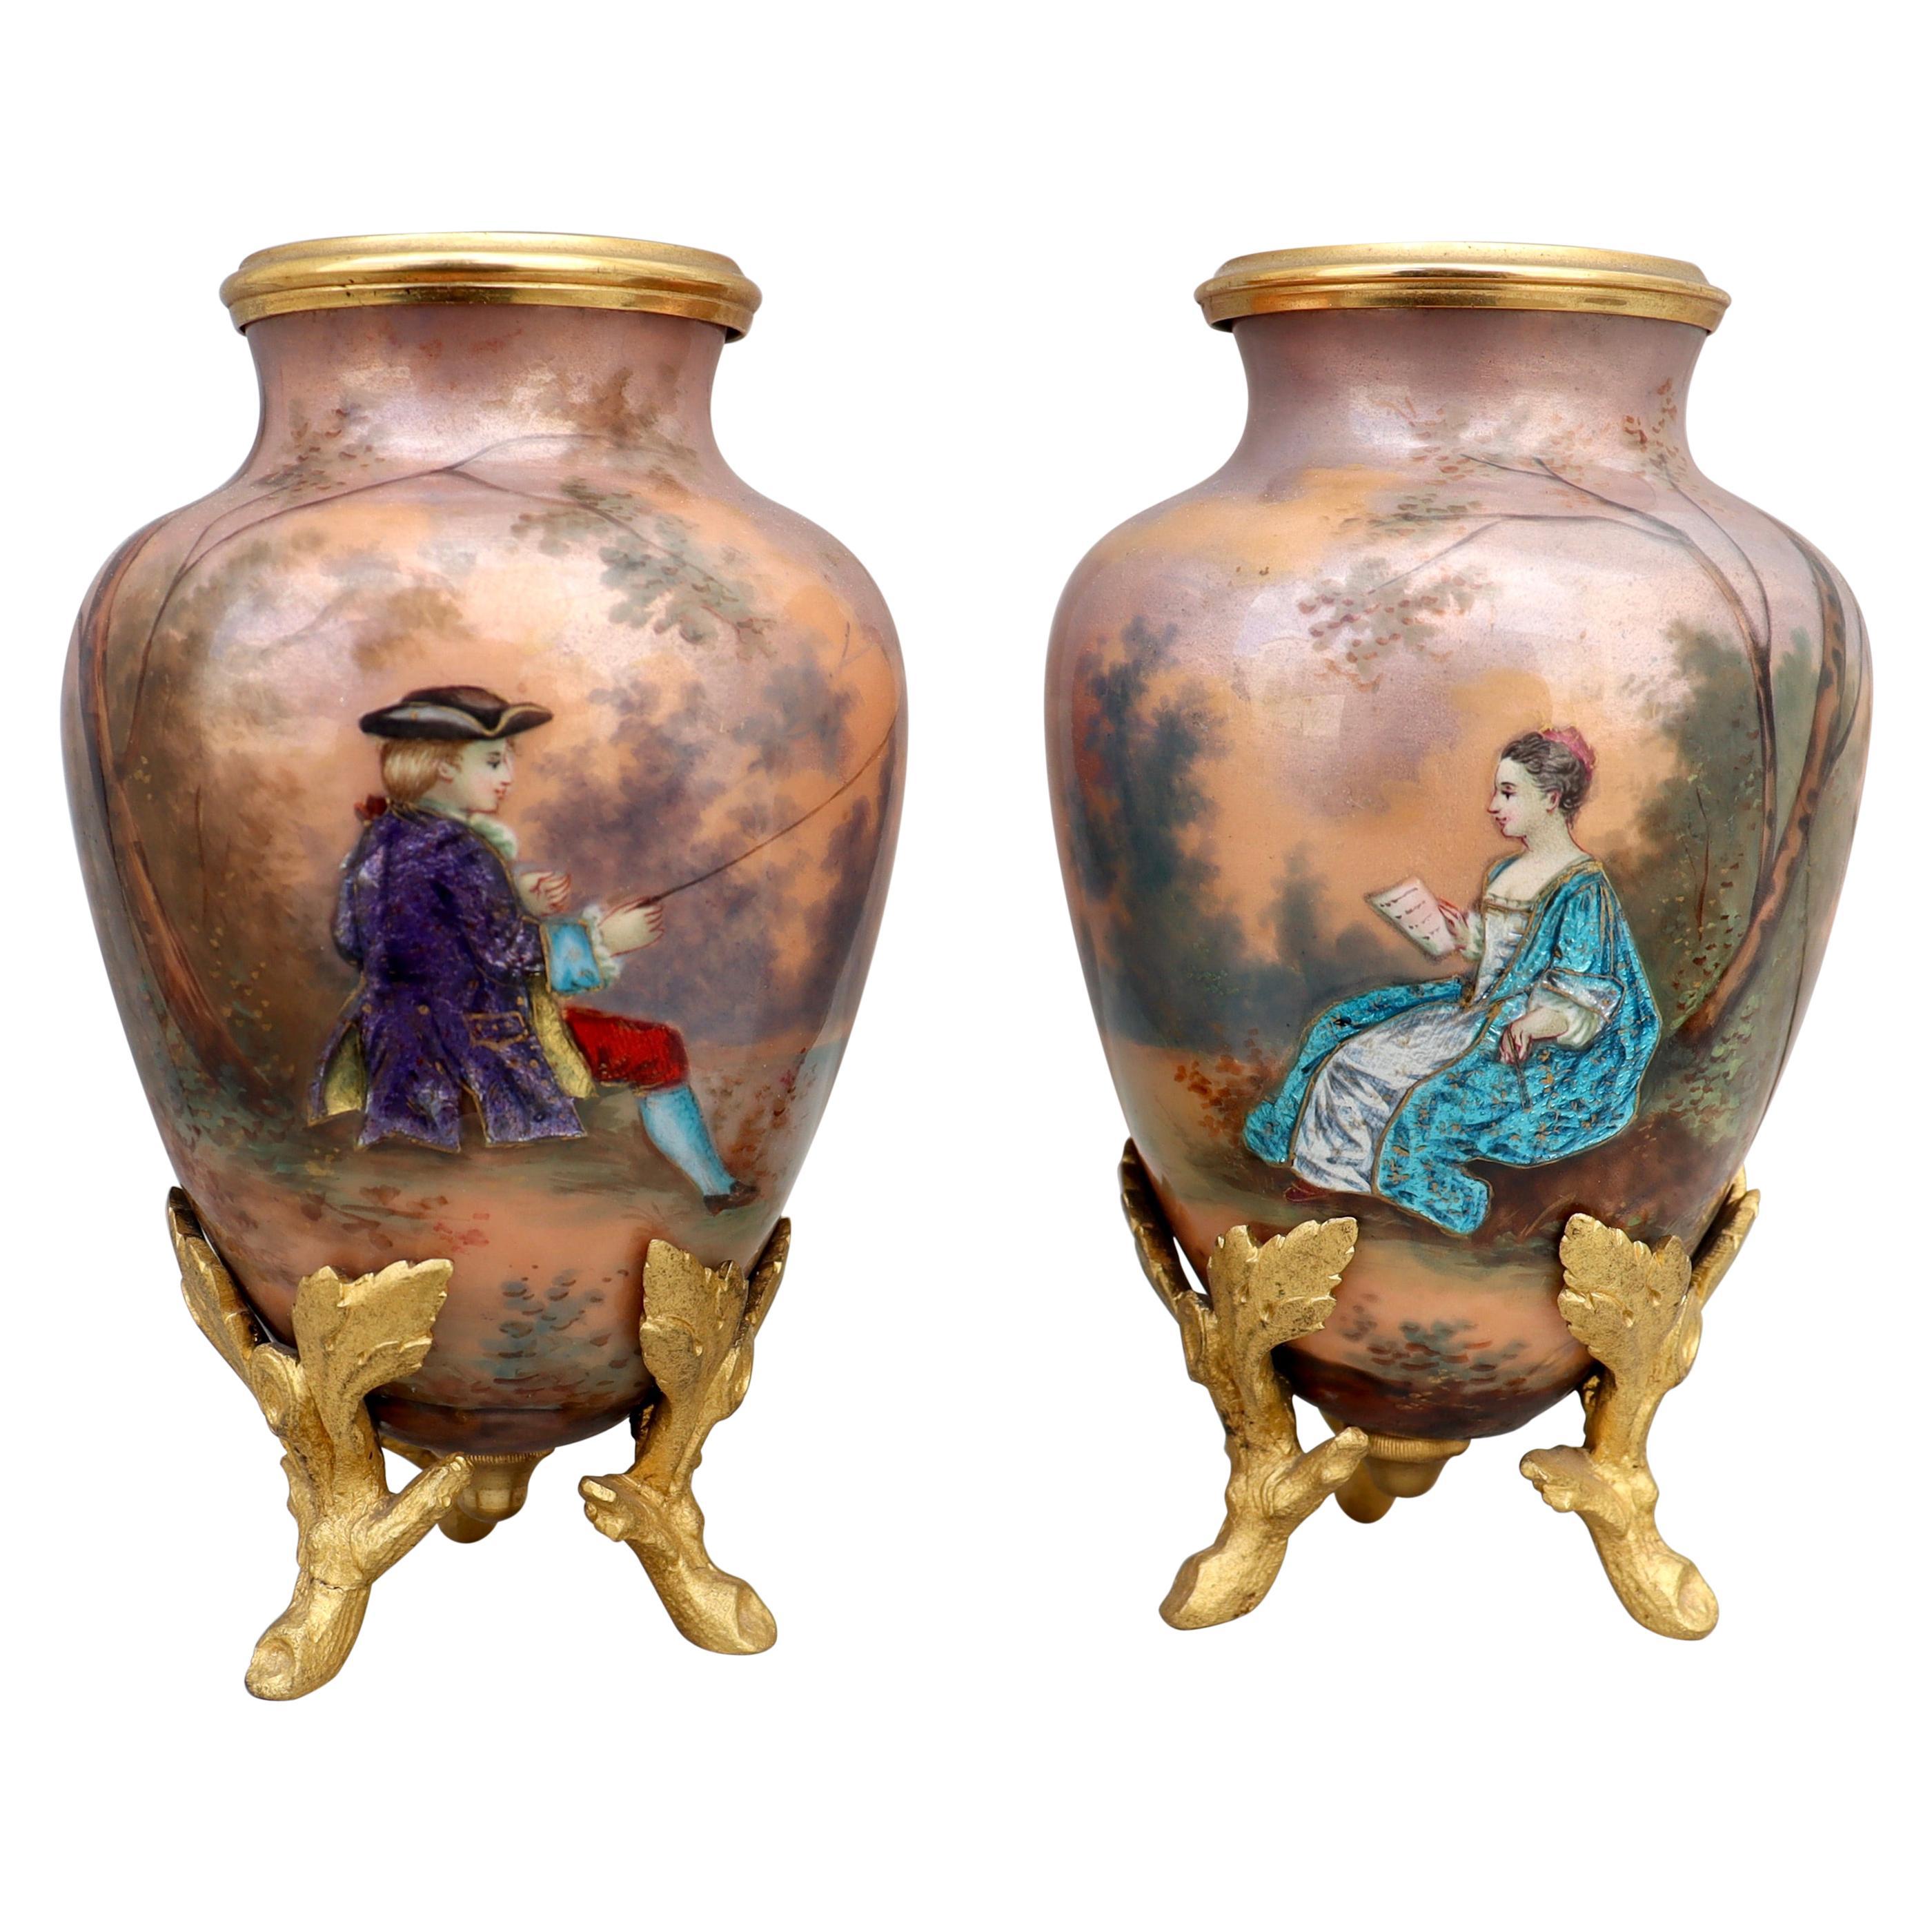 19th Century Pair of Napoléon III Limoges Enamel Vases